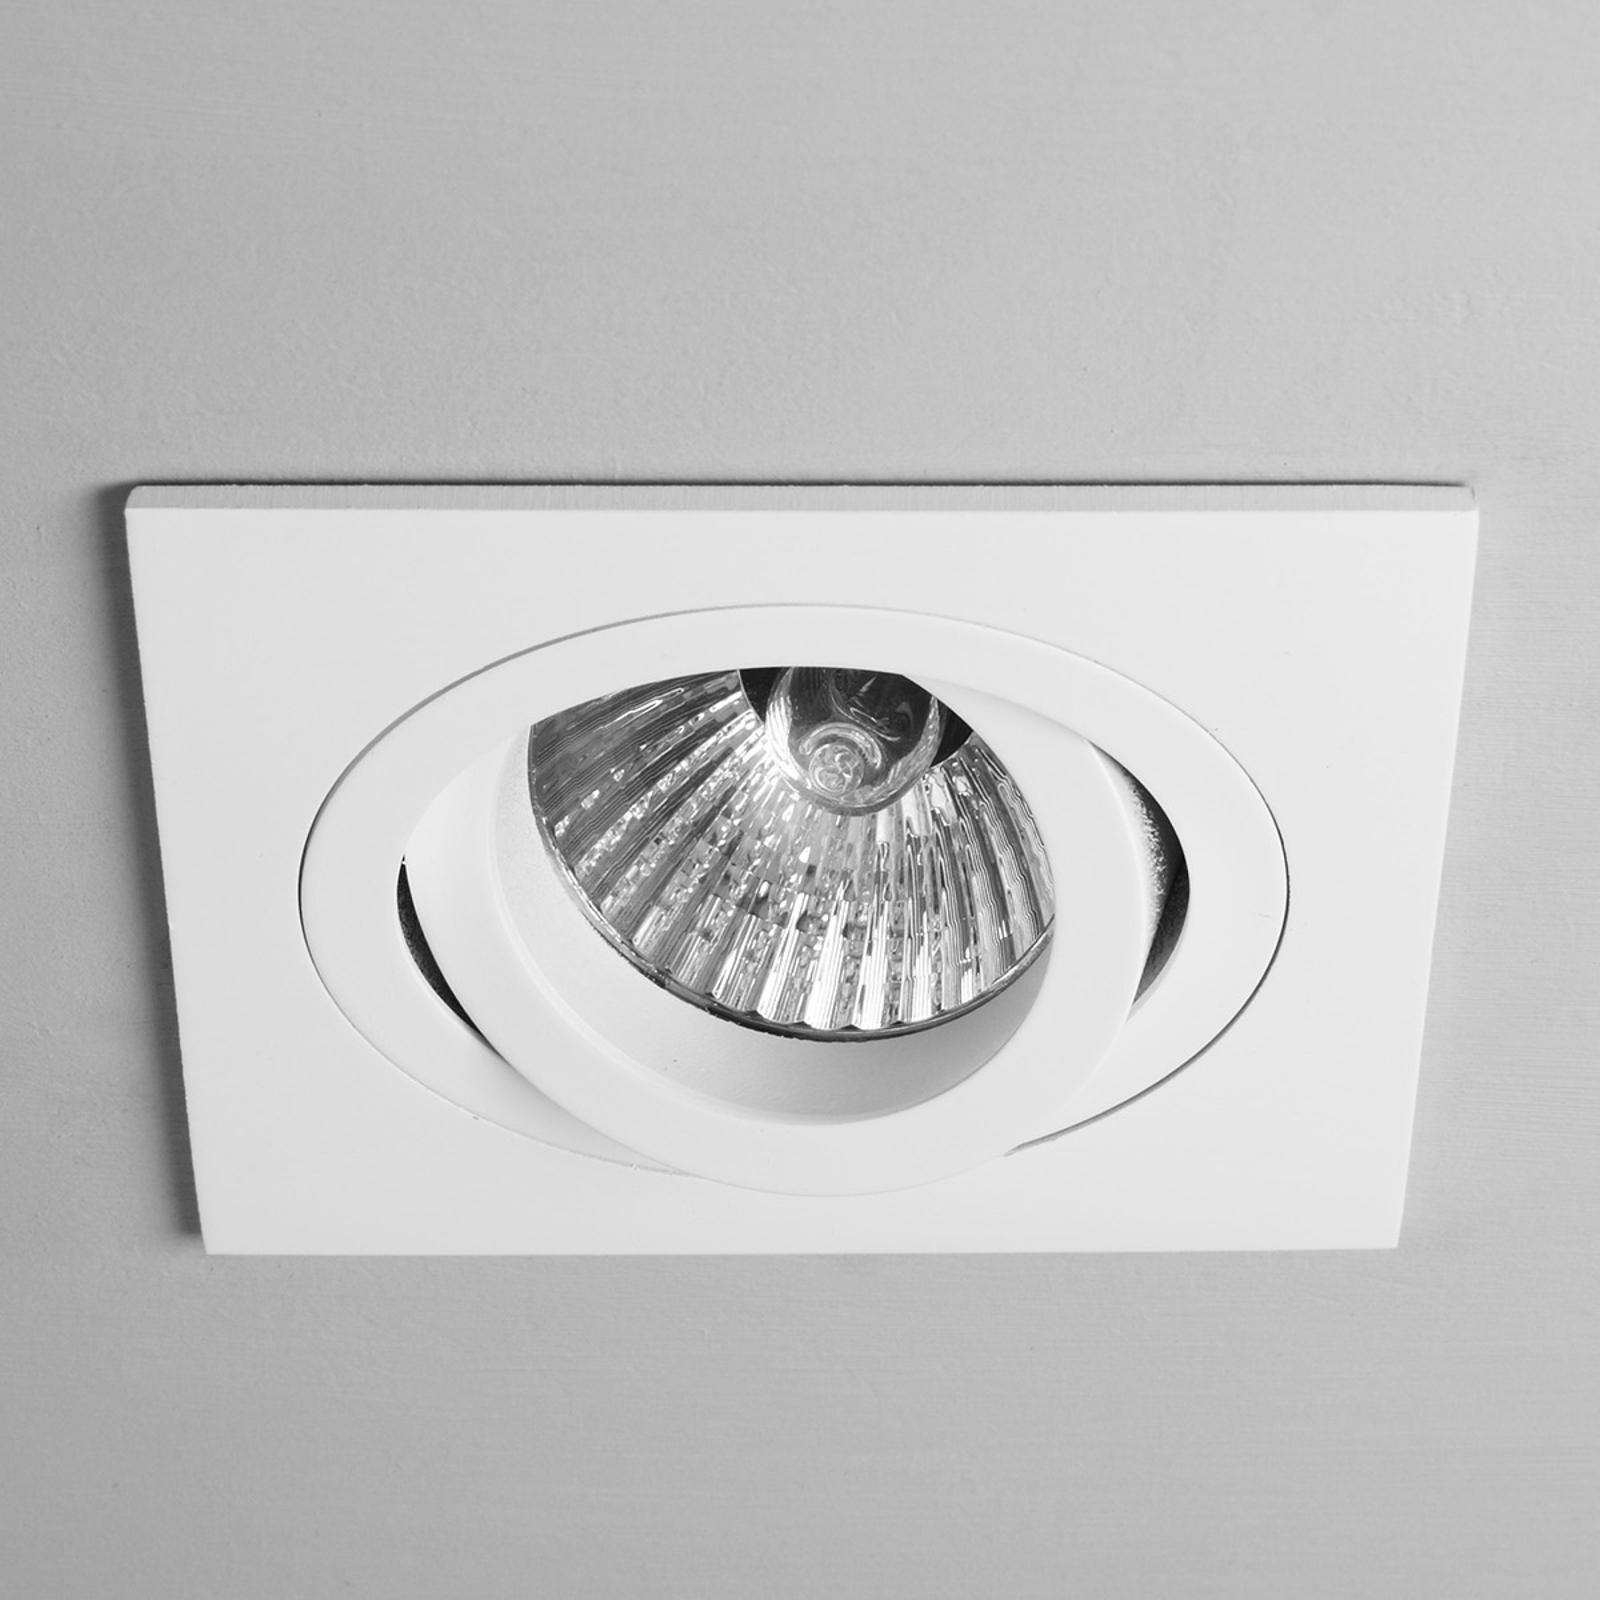 Astro Taro Square Adjustable spotlight vit 9,2 cm